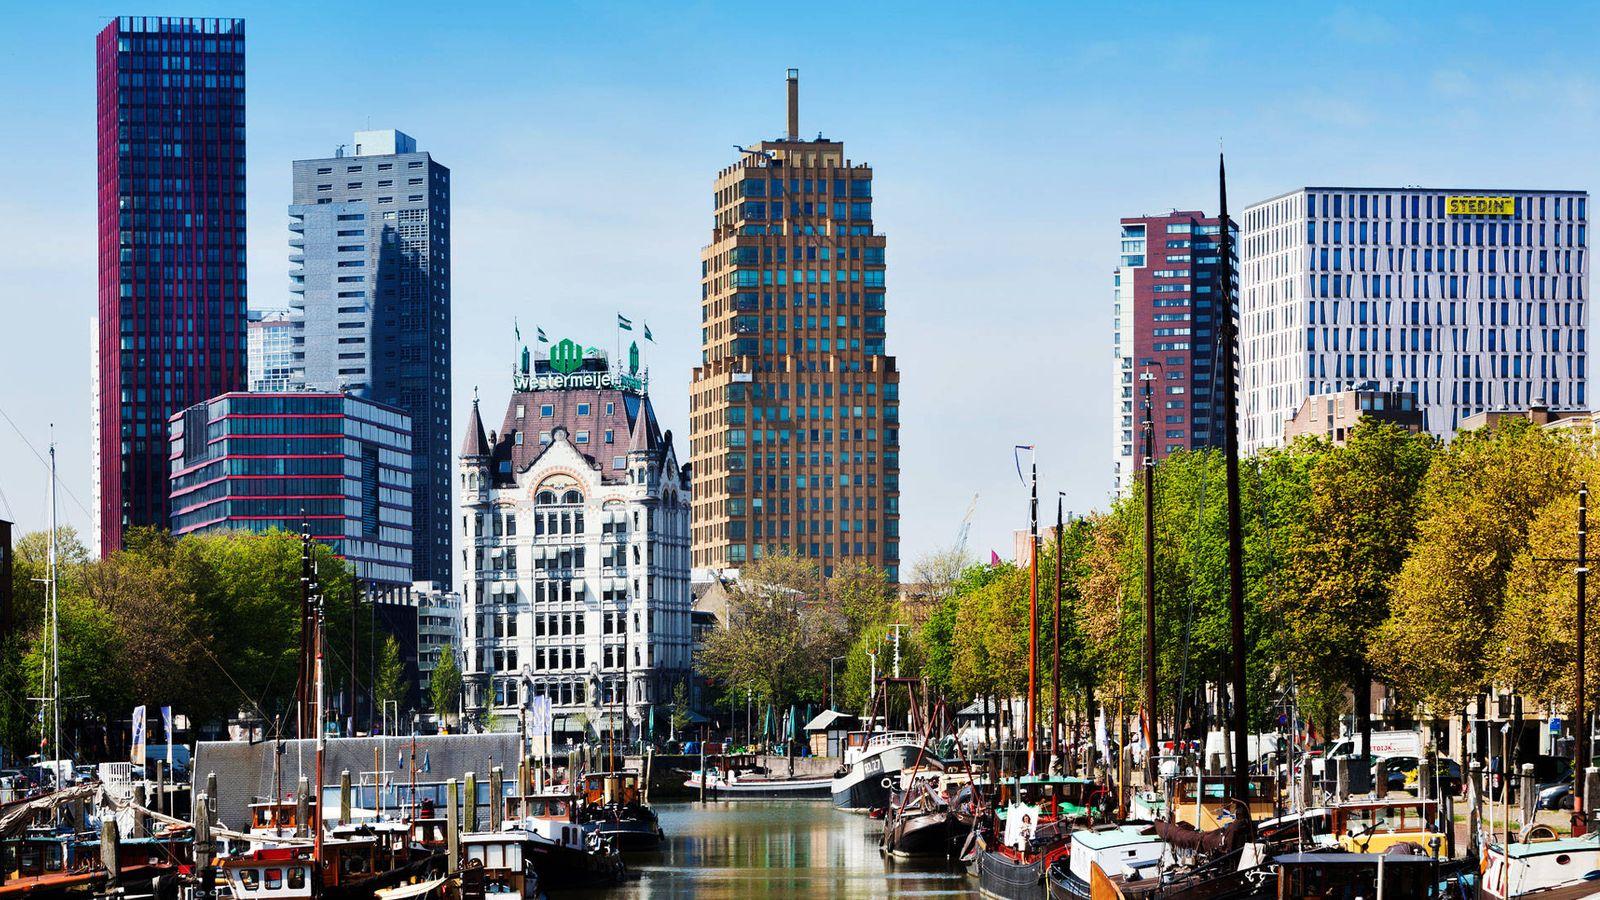 Foto: Imagen del skyline de Rotterdam. (iStock)